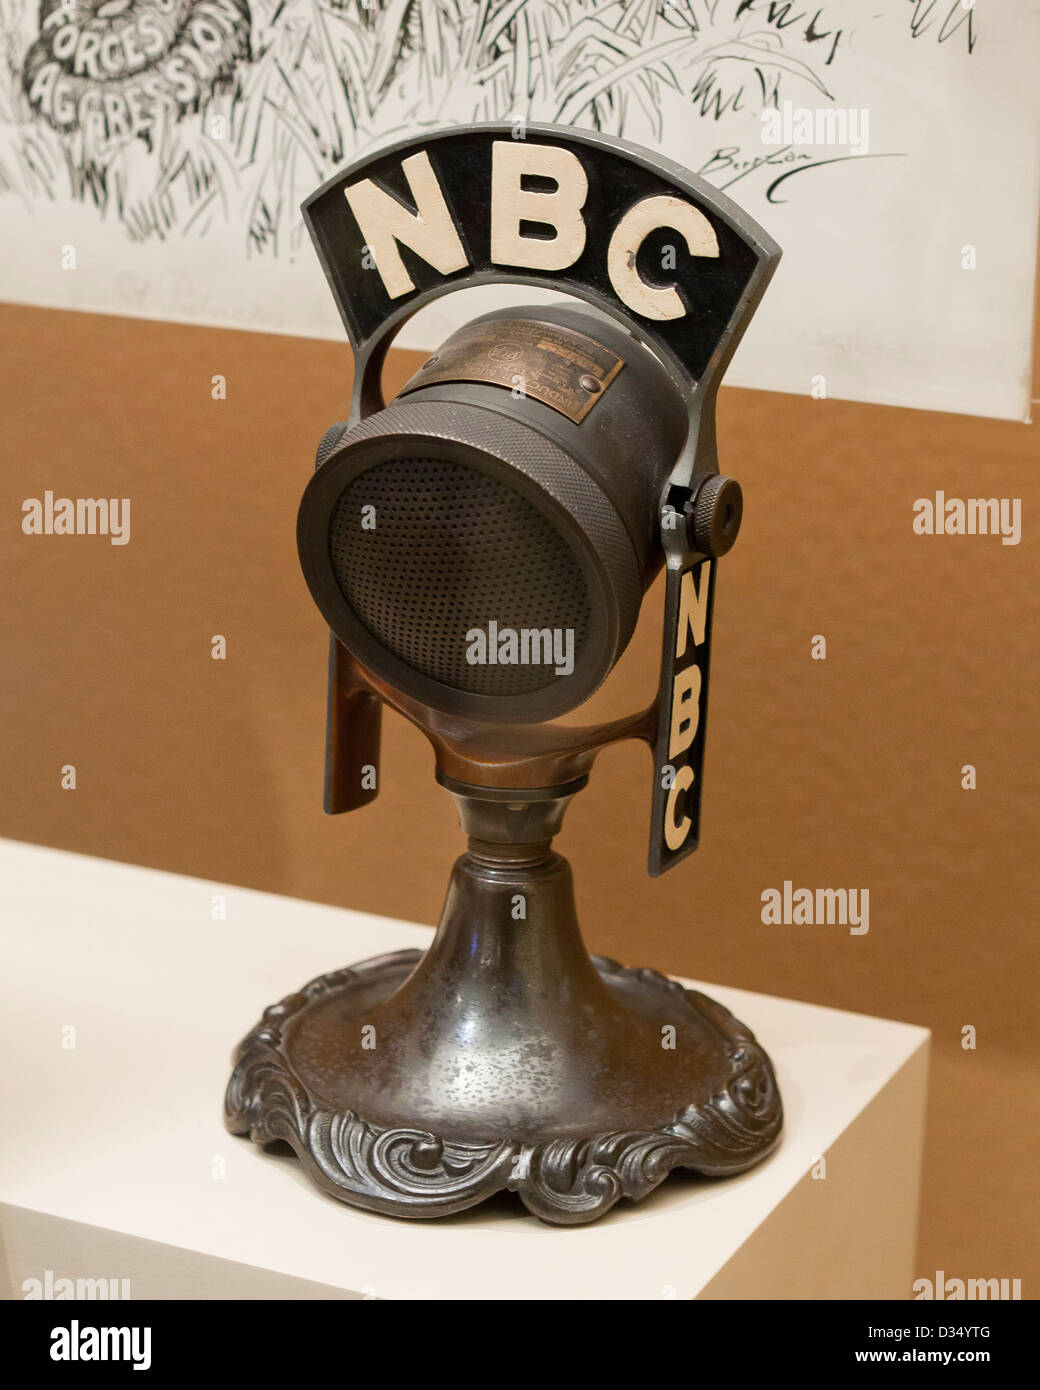 Vintage microphone NBC - circa 1933 Photo Stock